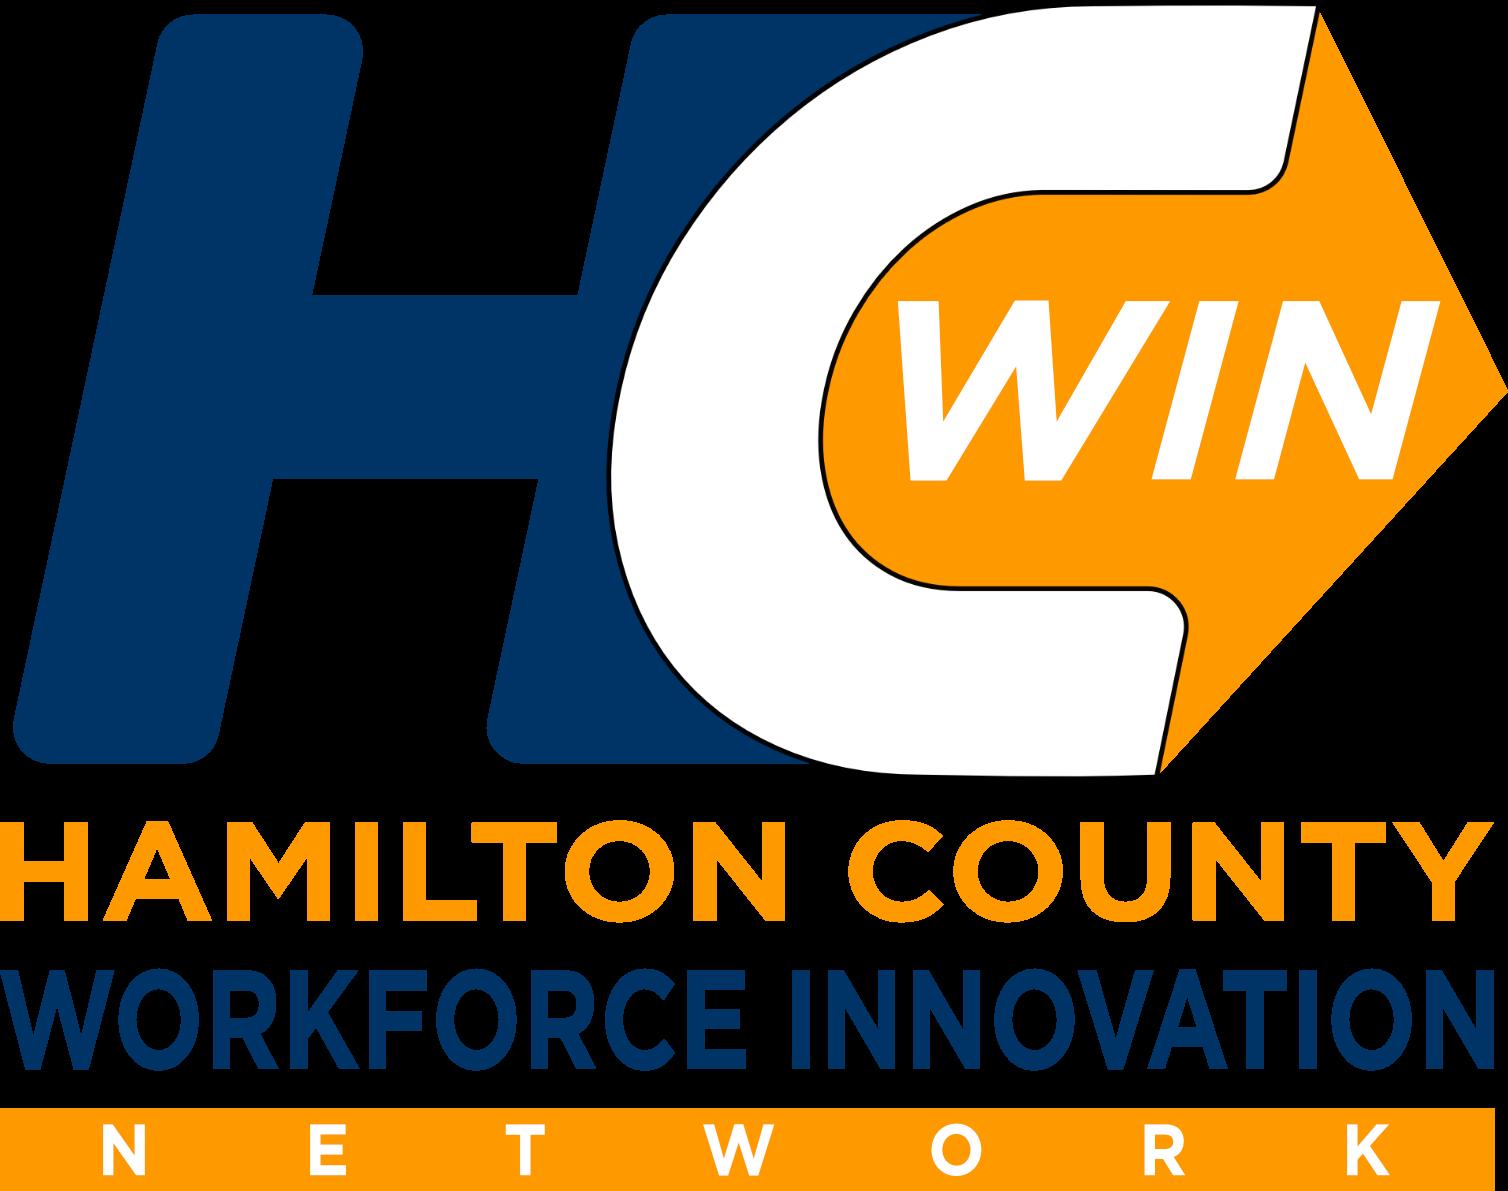 Hamilton County Workforce Innovation Network logo